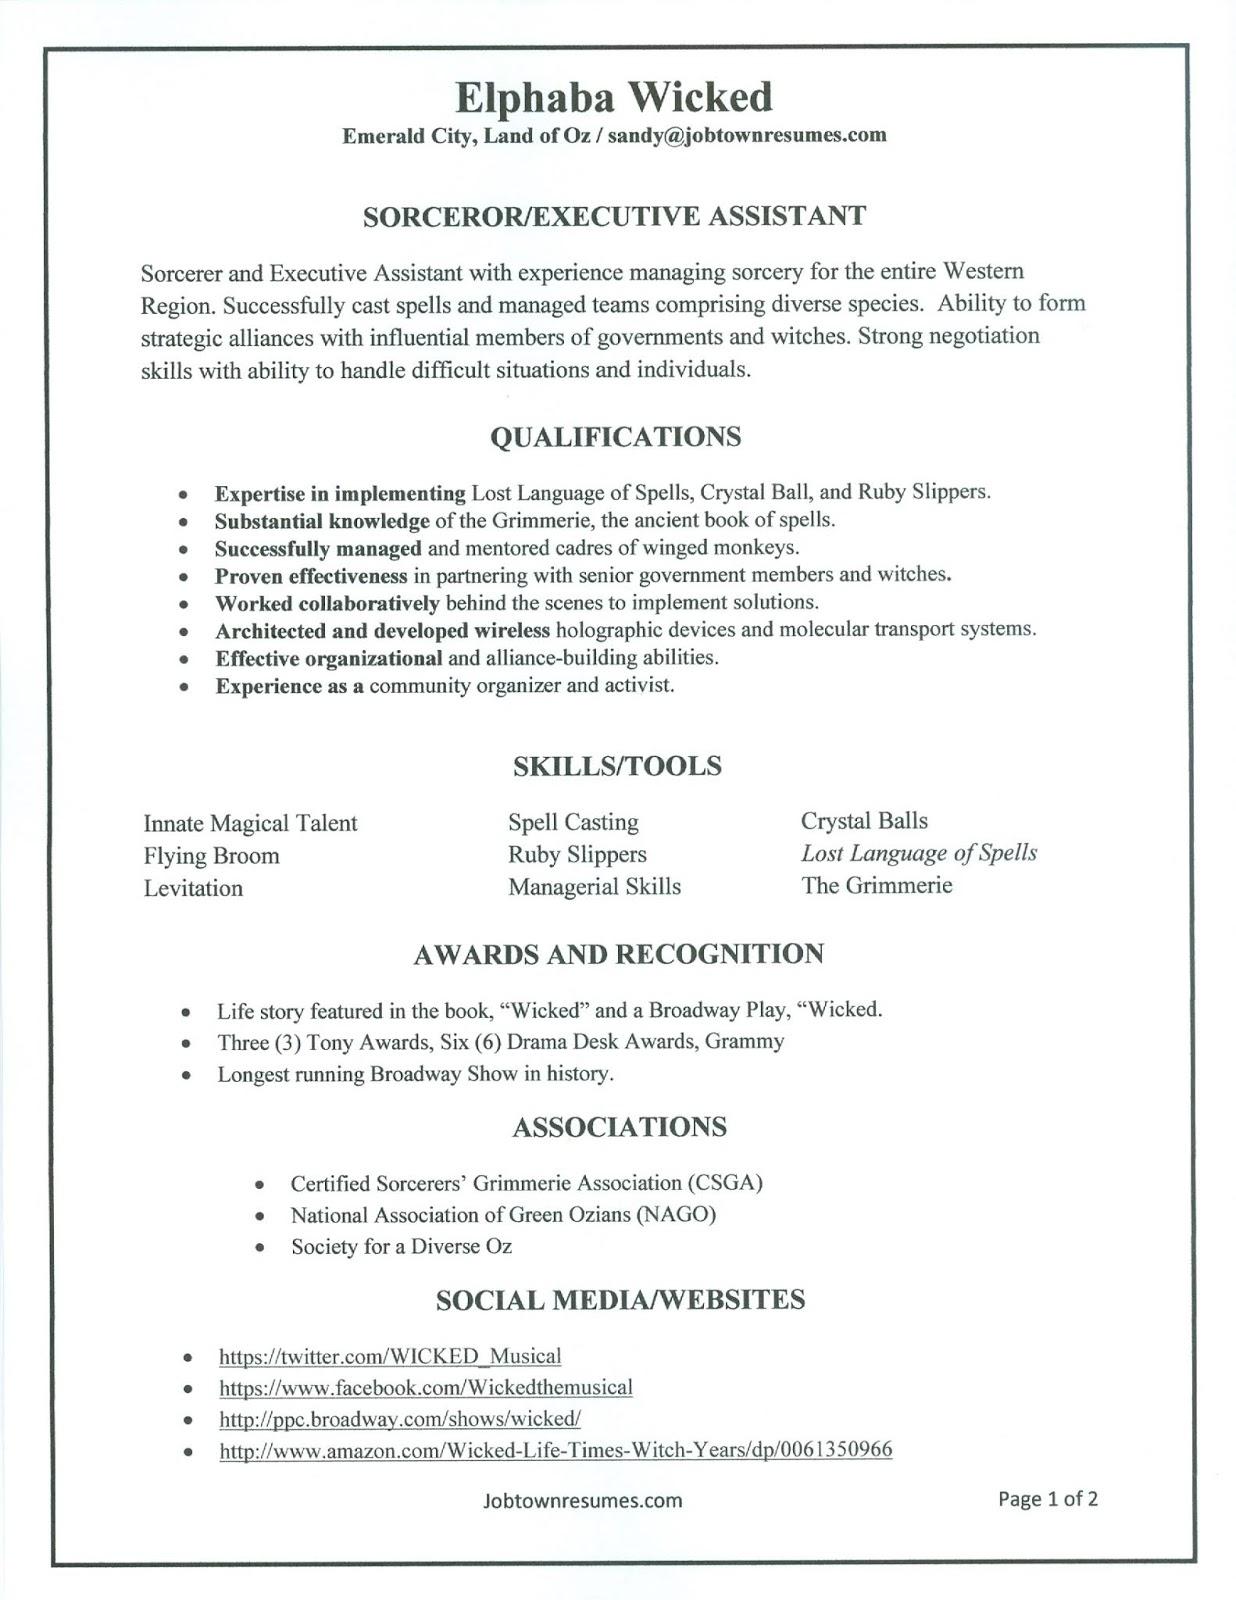 janitor resume objective janitor job objective resume resume objective for a janitor resume objective for janitor position janitor job objective for resume resume example for a janitor resume example for janitorial objective in a resume for a janitor sample resume objective for janitorial position example resume for janitorial services resume sample for janitorial services example resume janitorial position example of a resume for a janitor resume examples for janitor jobs